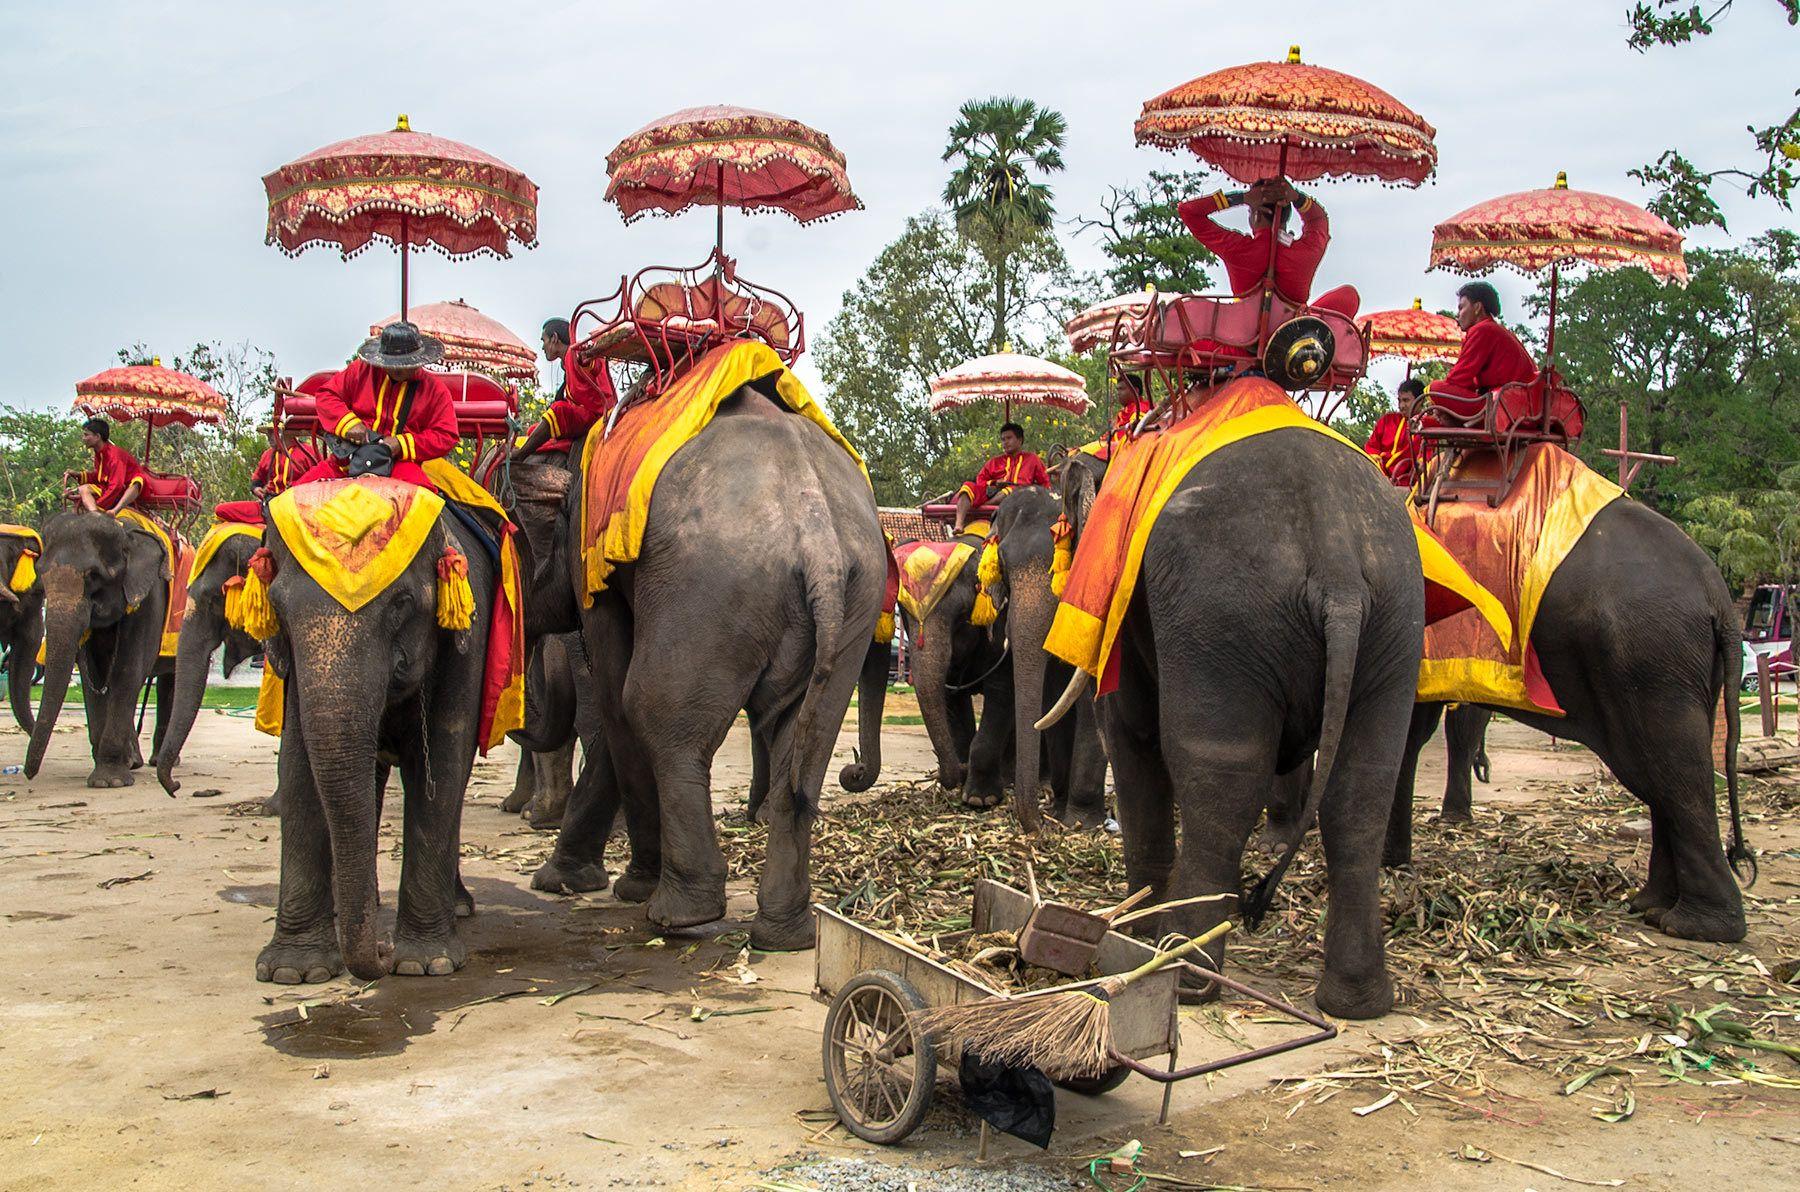 Elephants, Ayutthaya, Thailand